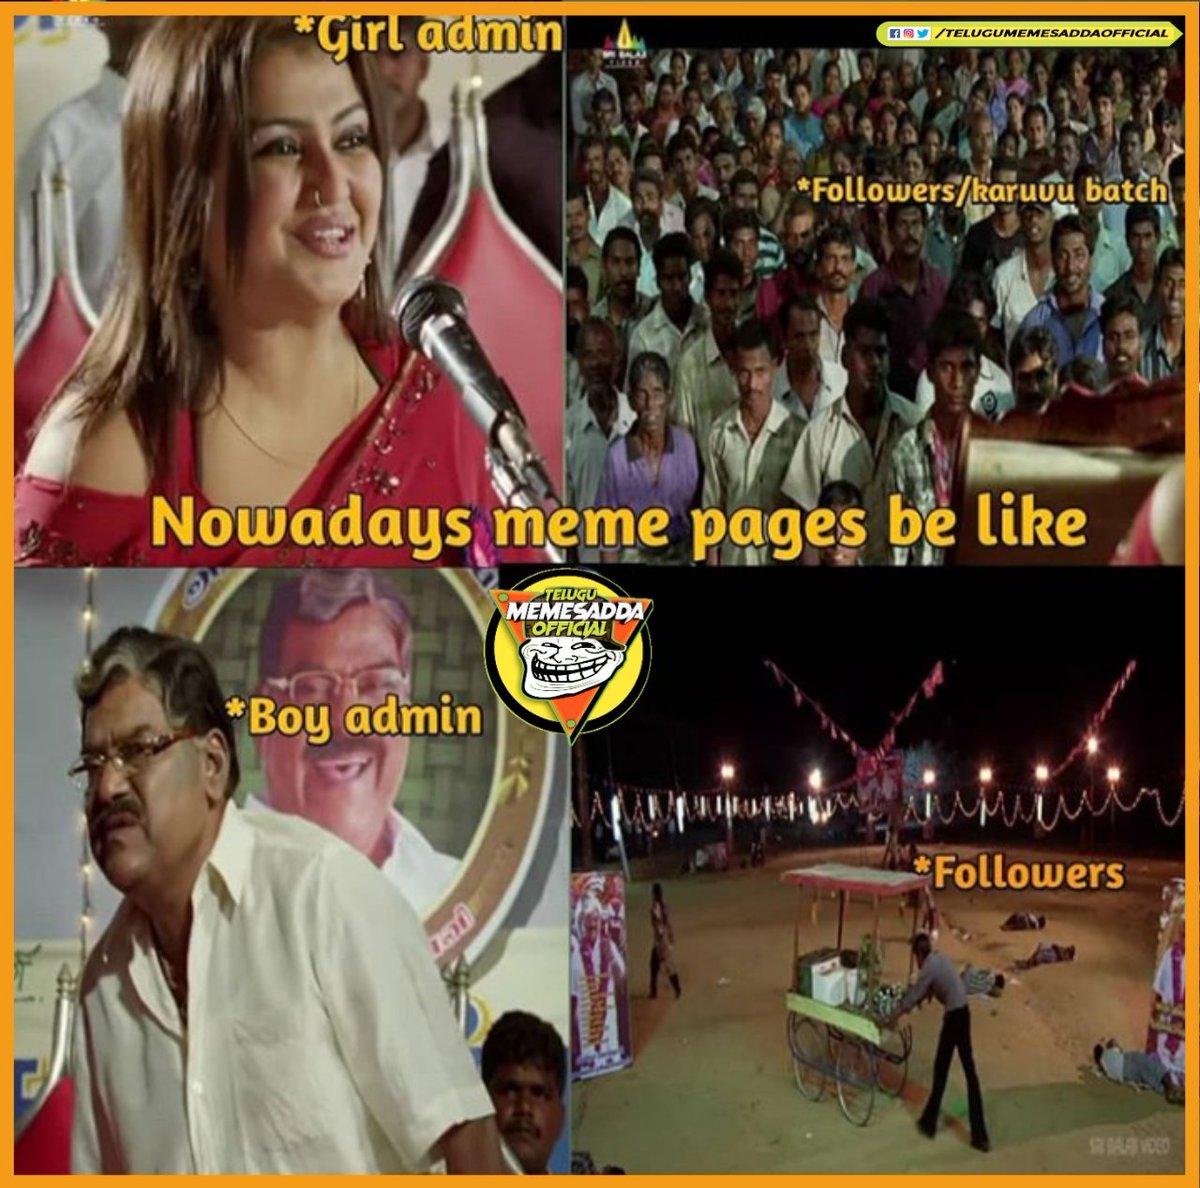 FOLLOW & SHARE  *TeluguMemesAddaOfficial.*  For More Entertainment And Updates  #vijaydevarakonda,#Maheshbabu,#Pawankalyan,#unprofessionaltrollers,#telugudubsmash,#rashmikamadanna,#Anupamaparameswaran,#Prabhas,#Alluarjun,#nani,#kajalagarwal,#keerthisuresh,#poojahedgepic.twitter.com/vvdPBeSWFG